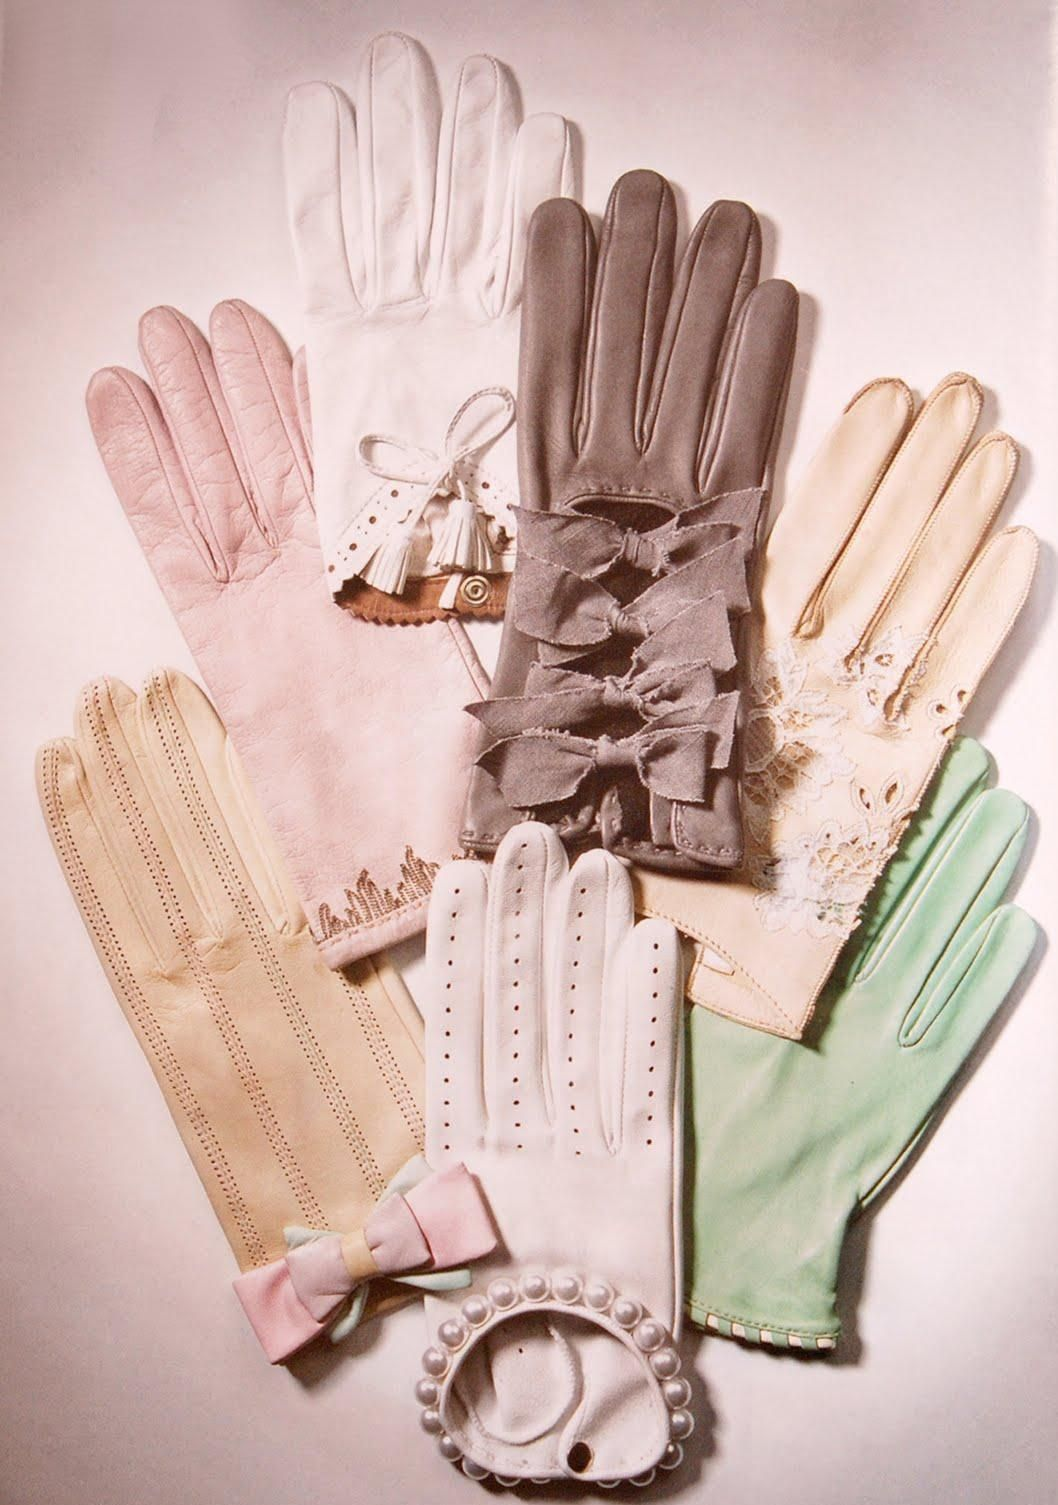 Driving gloves auckland - Gloves